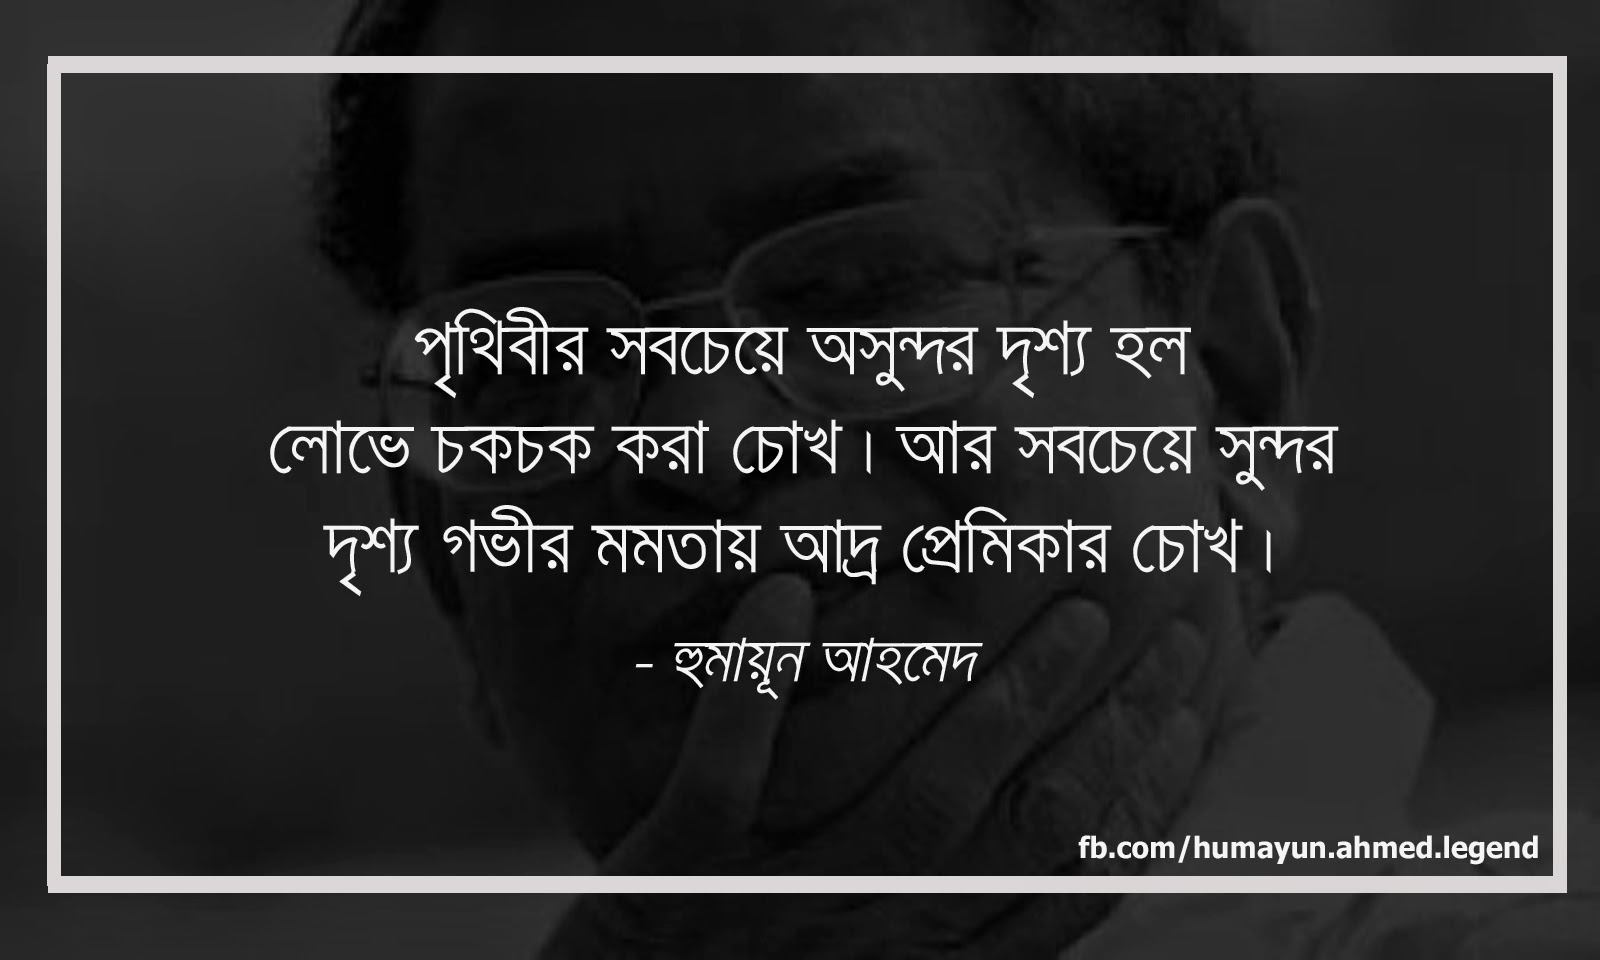 Love Quotes For Girlfriend In Bengali • Opzetzwembadshop nl